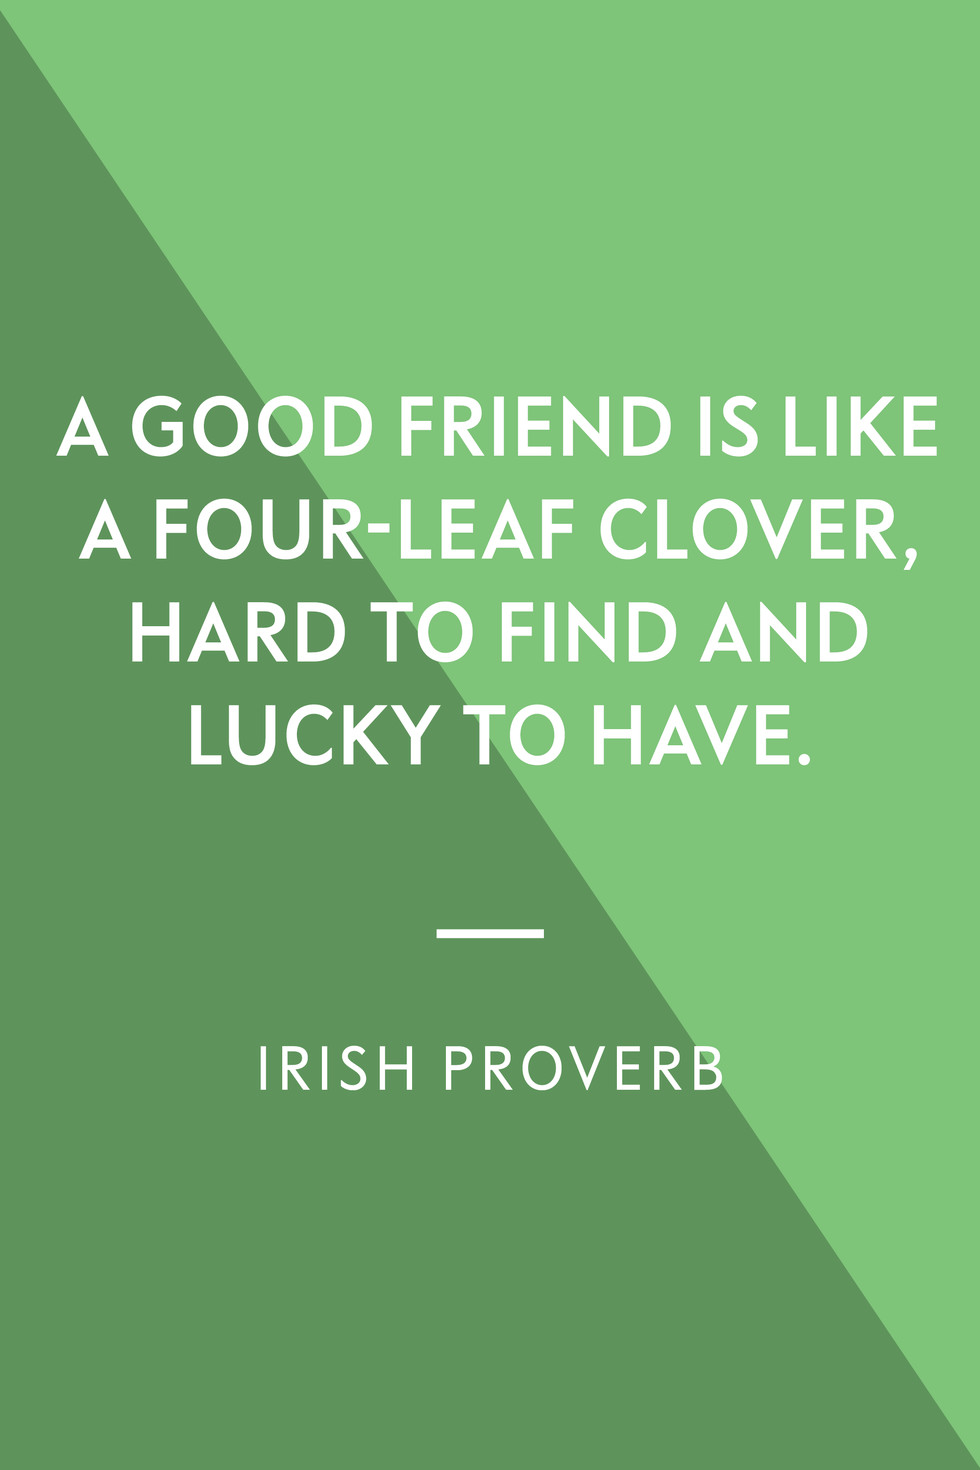 Saint Patrick's Day Quotes  20